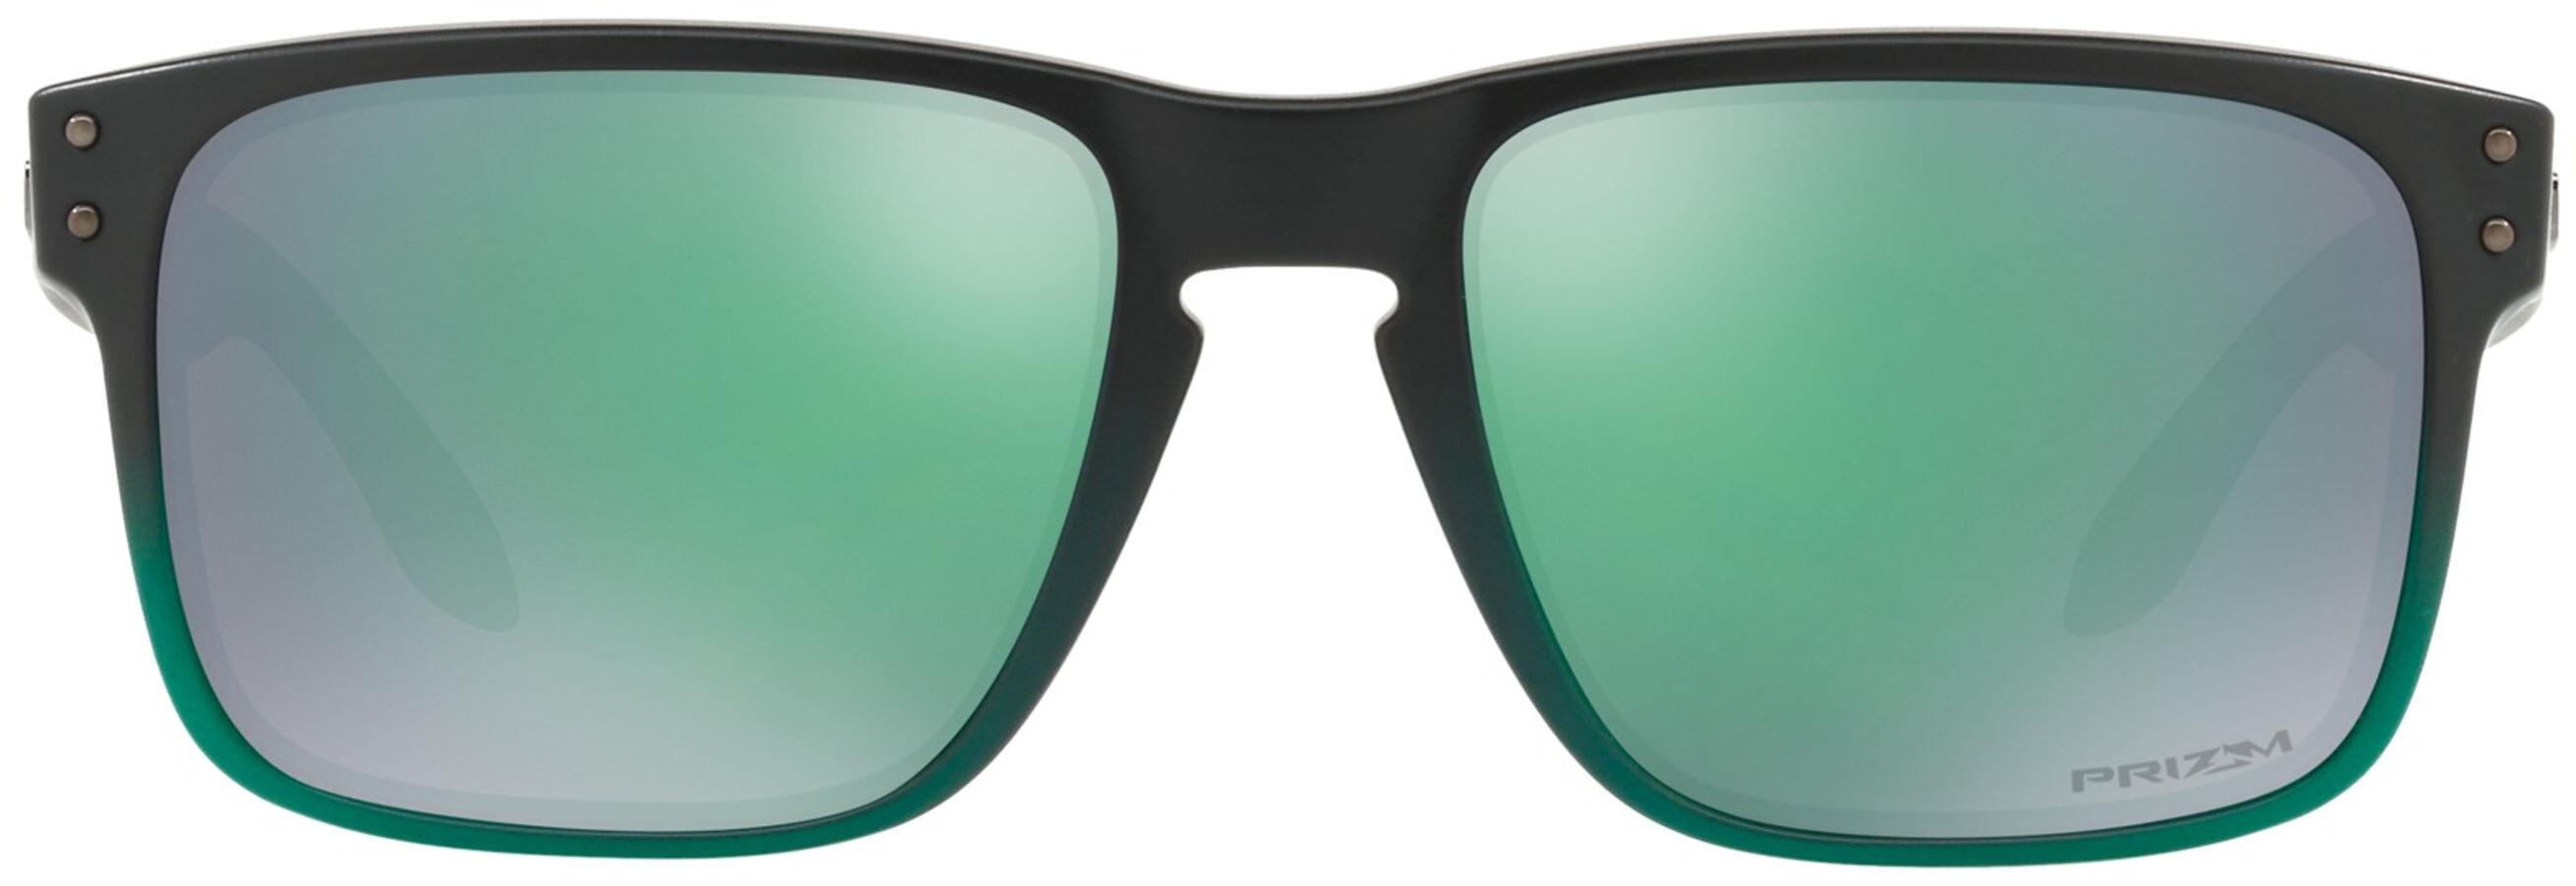 27bc1cbc00 Oakley Holbrook - Gafas ciclismo - verde/negro | Bikester.es